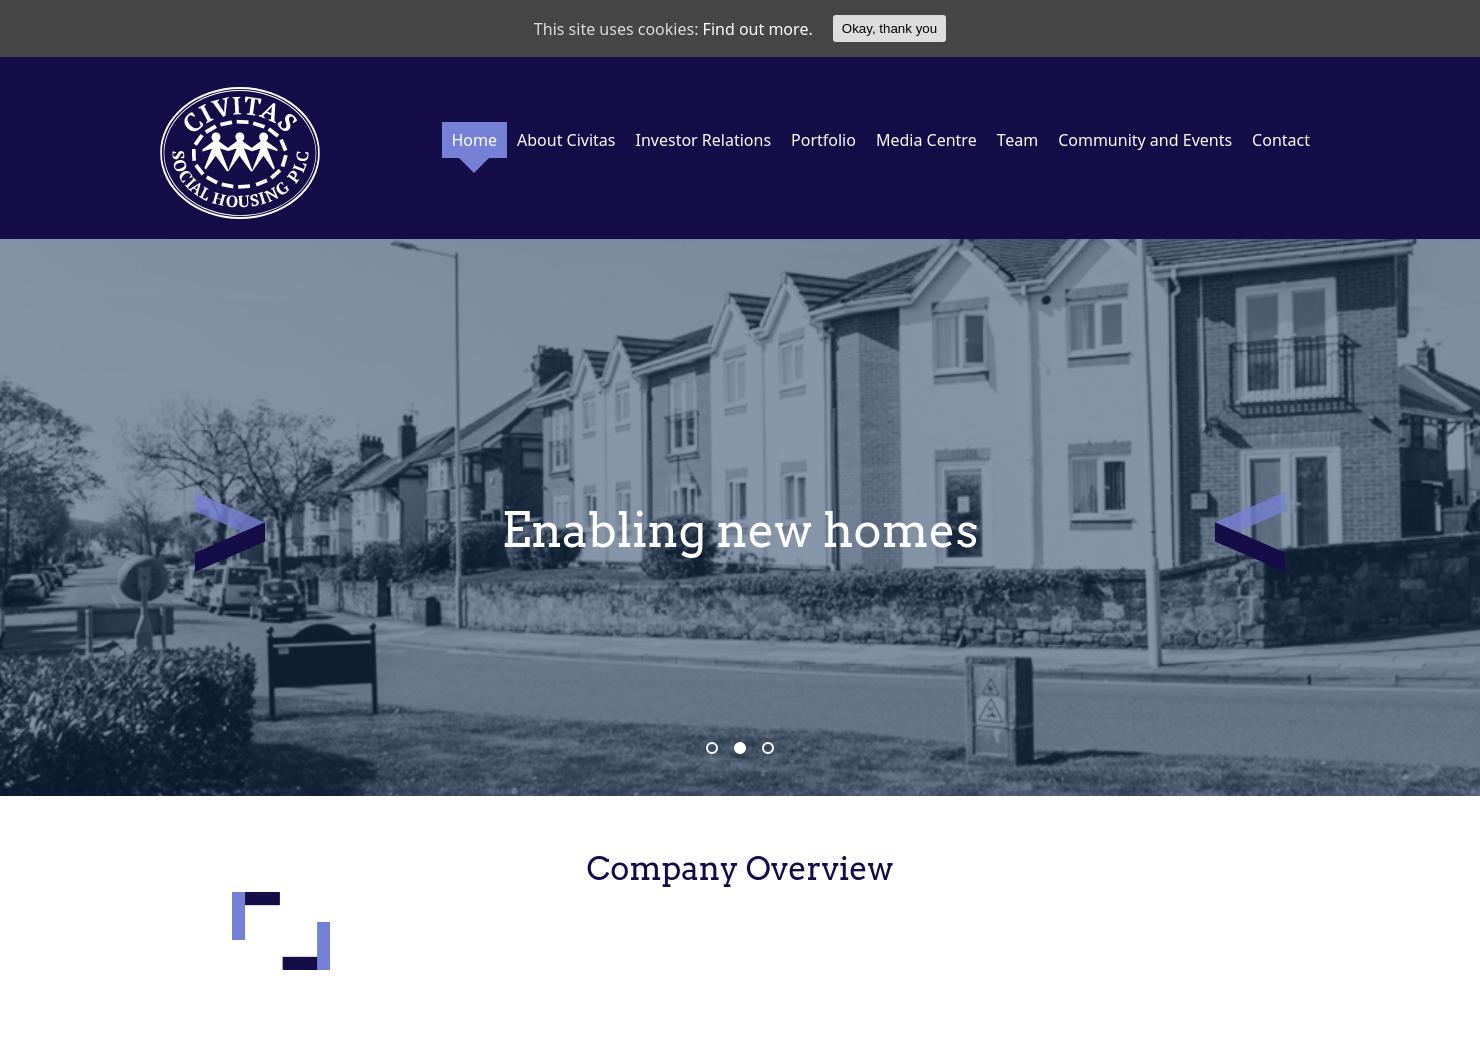 Civitas Social Housing Home Page